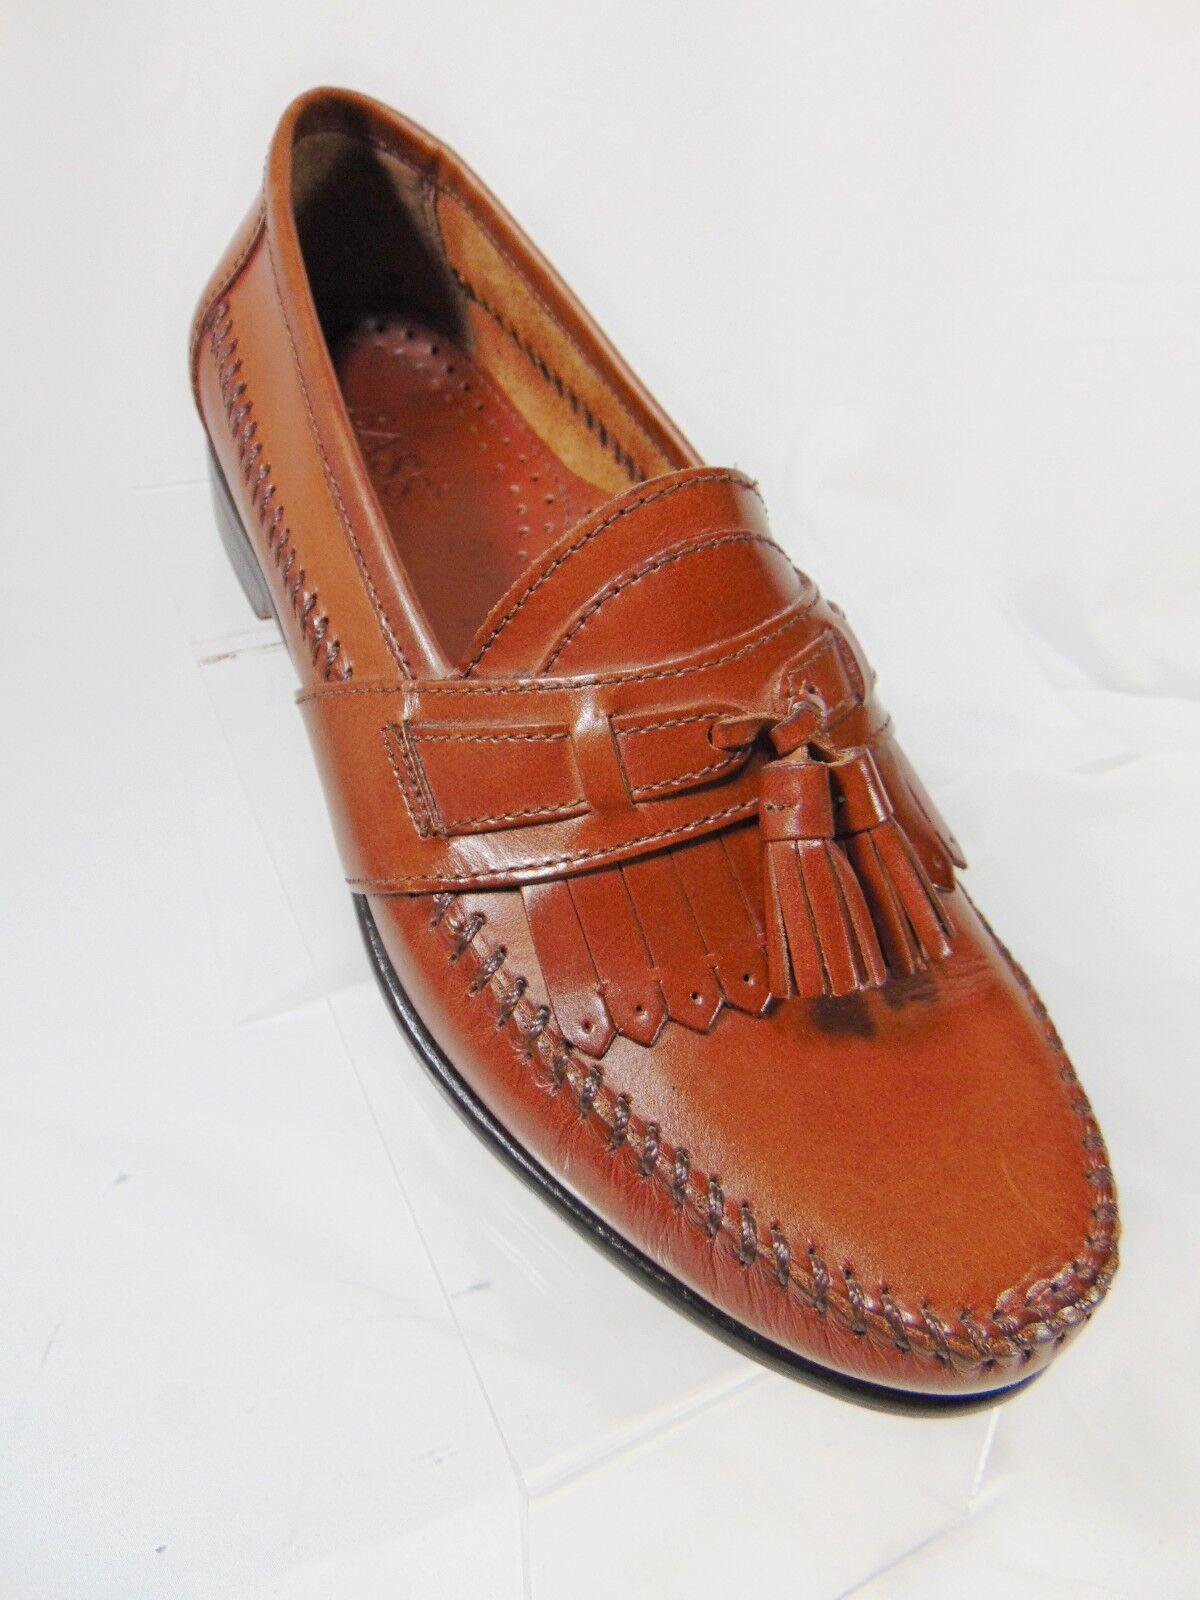 BASS Women's Kiltie Tassel Loafer Style shoes 7.5 M Brown Slip On Brazil Leather